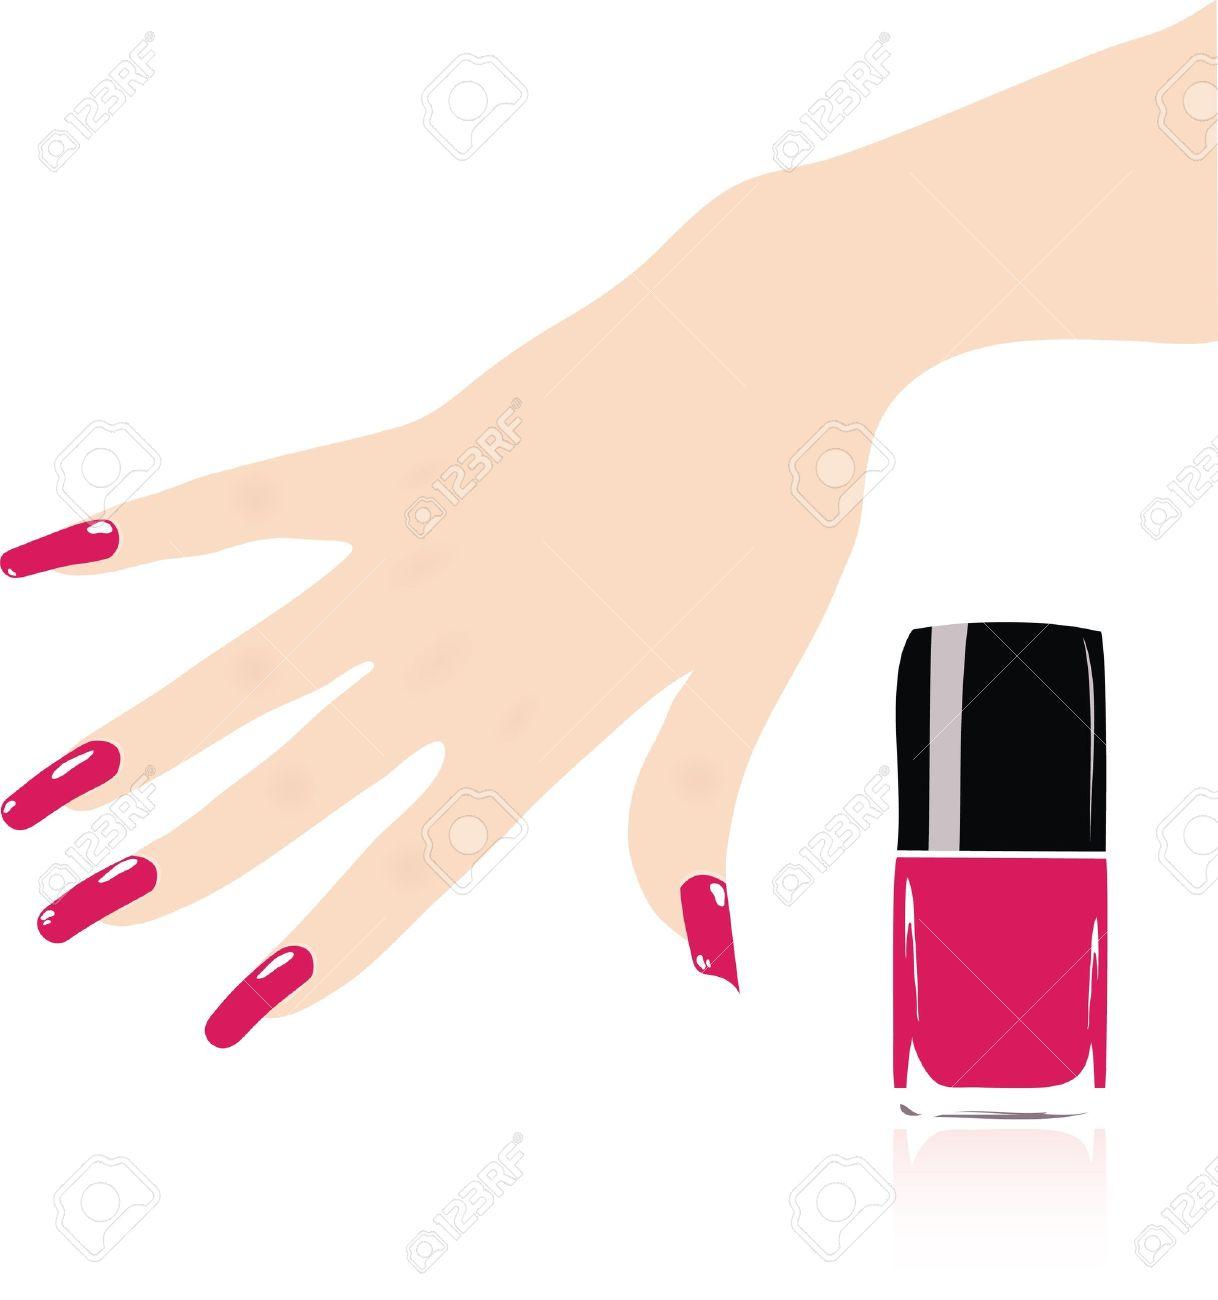 Nail Salon Woman Hand With-Nail Salon Woman Hand With-2